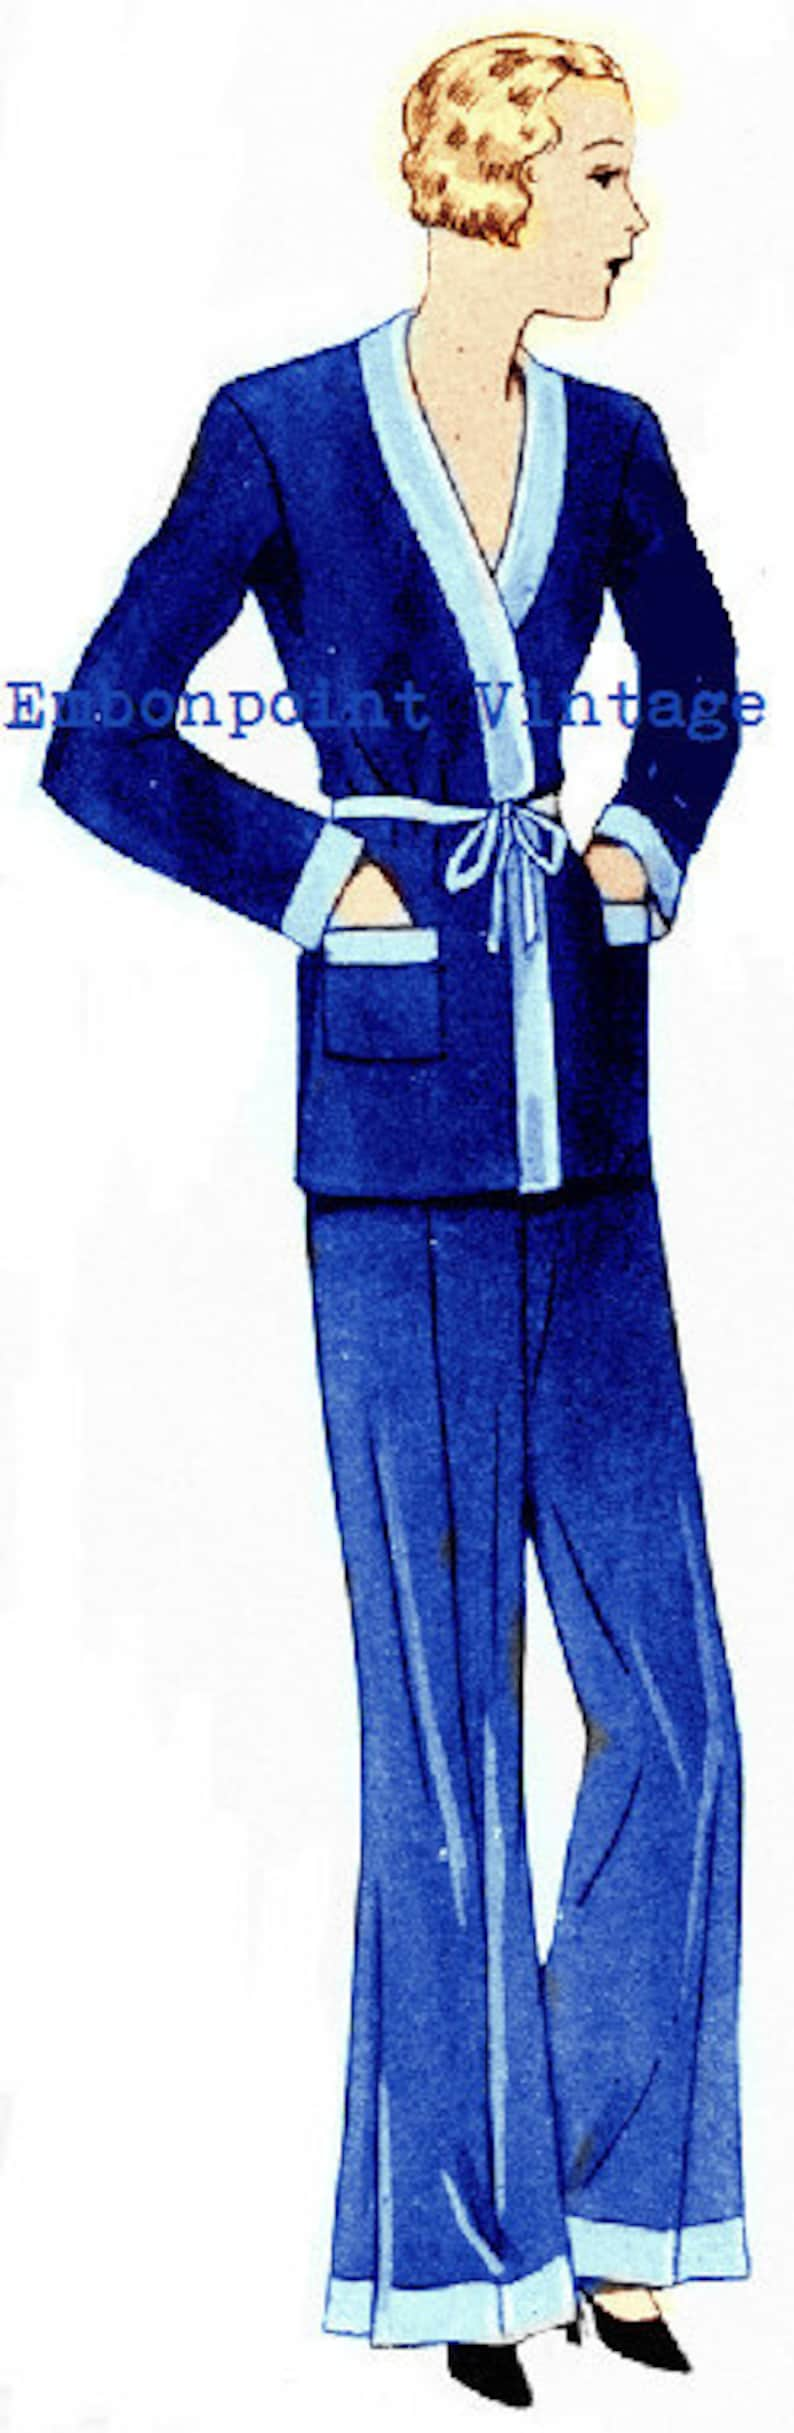 1930s Sewing Patterns- Dresses, Pants, Tops Plus Size (or any size) 1934 Vintage Pyjamas Sewing Pattern - PDF - Pattern No 27 Estella 1930s 30s Instant Download $9.50 AT vintagedancer.com